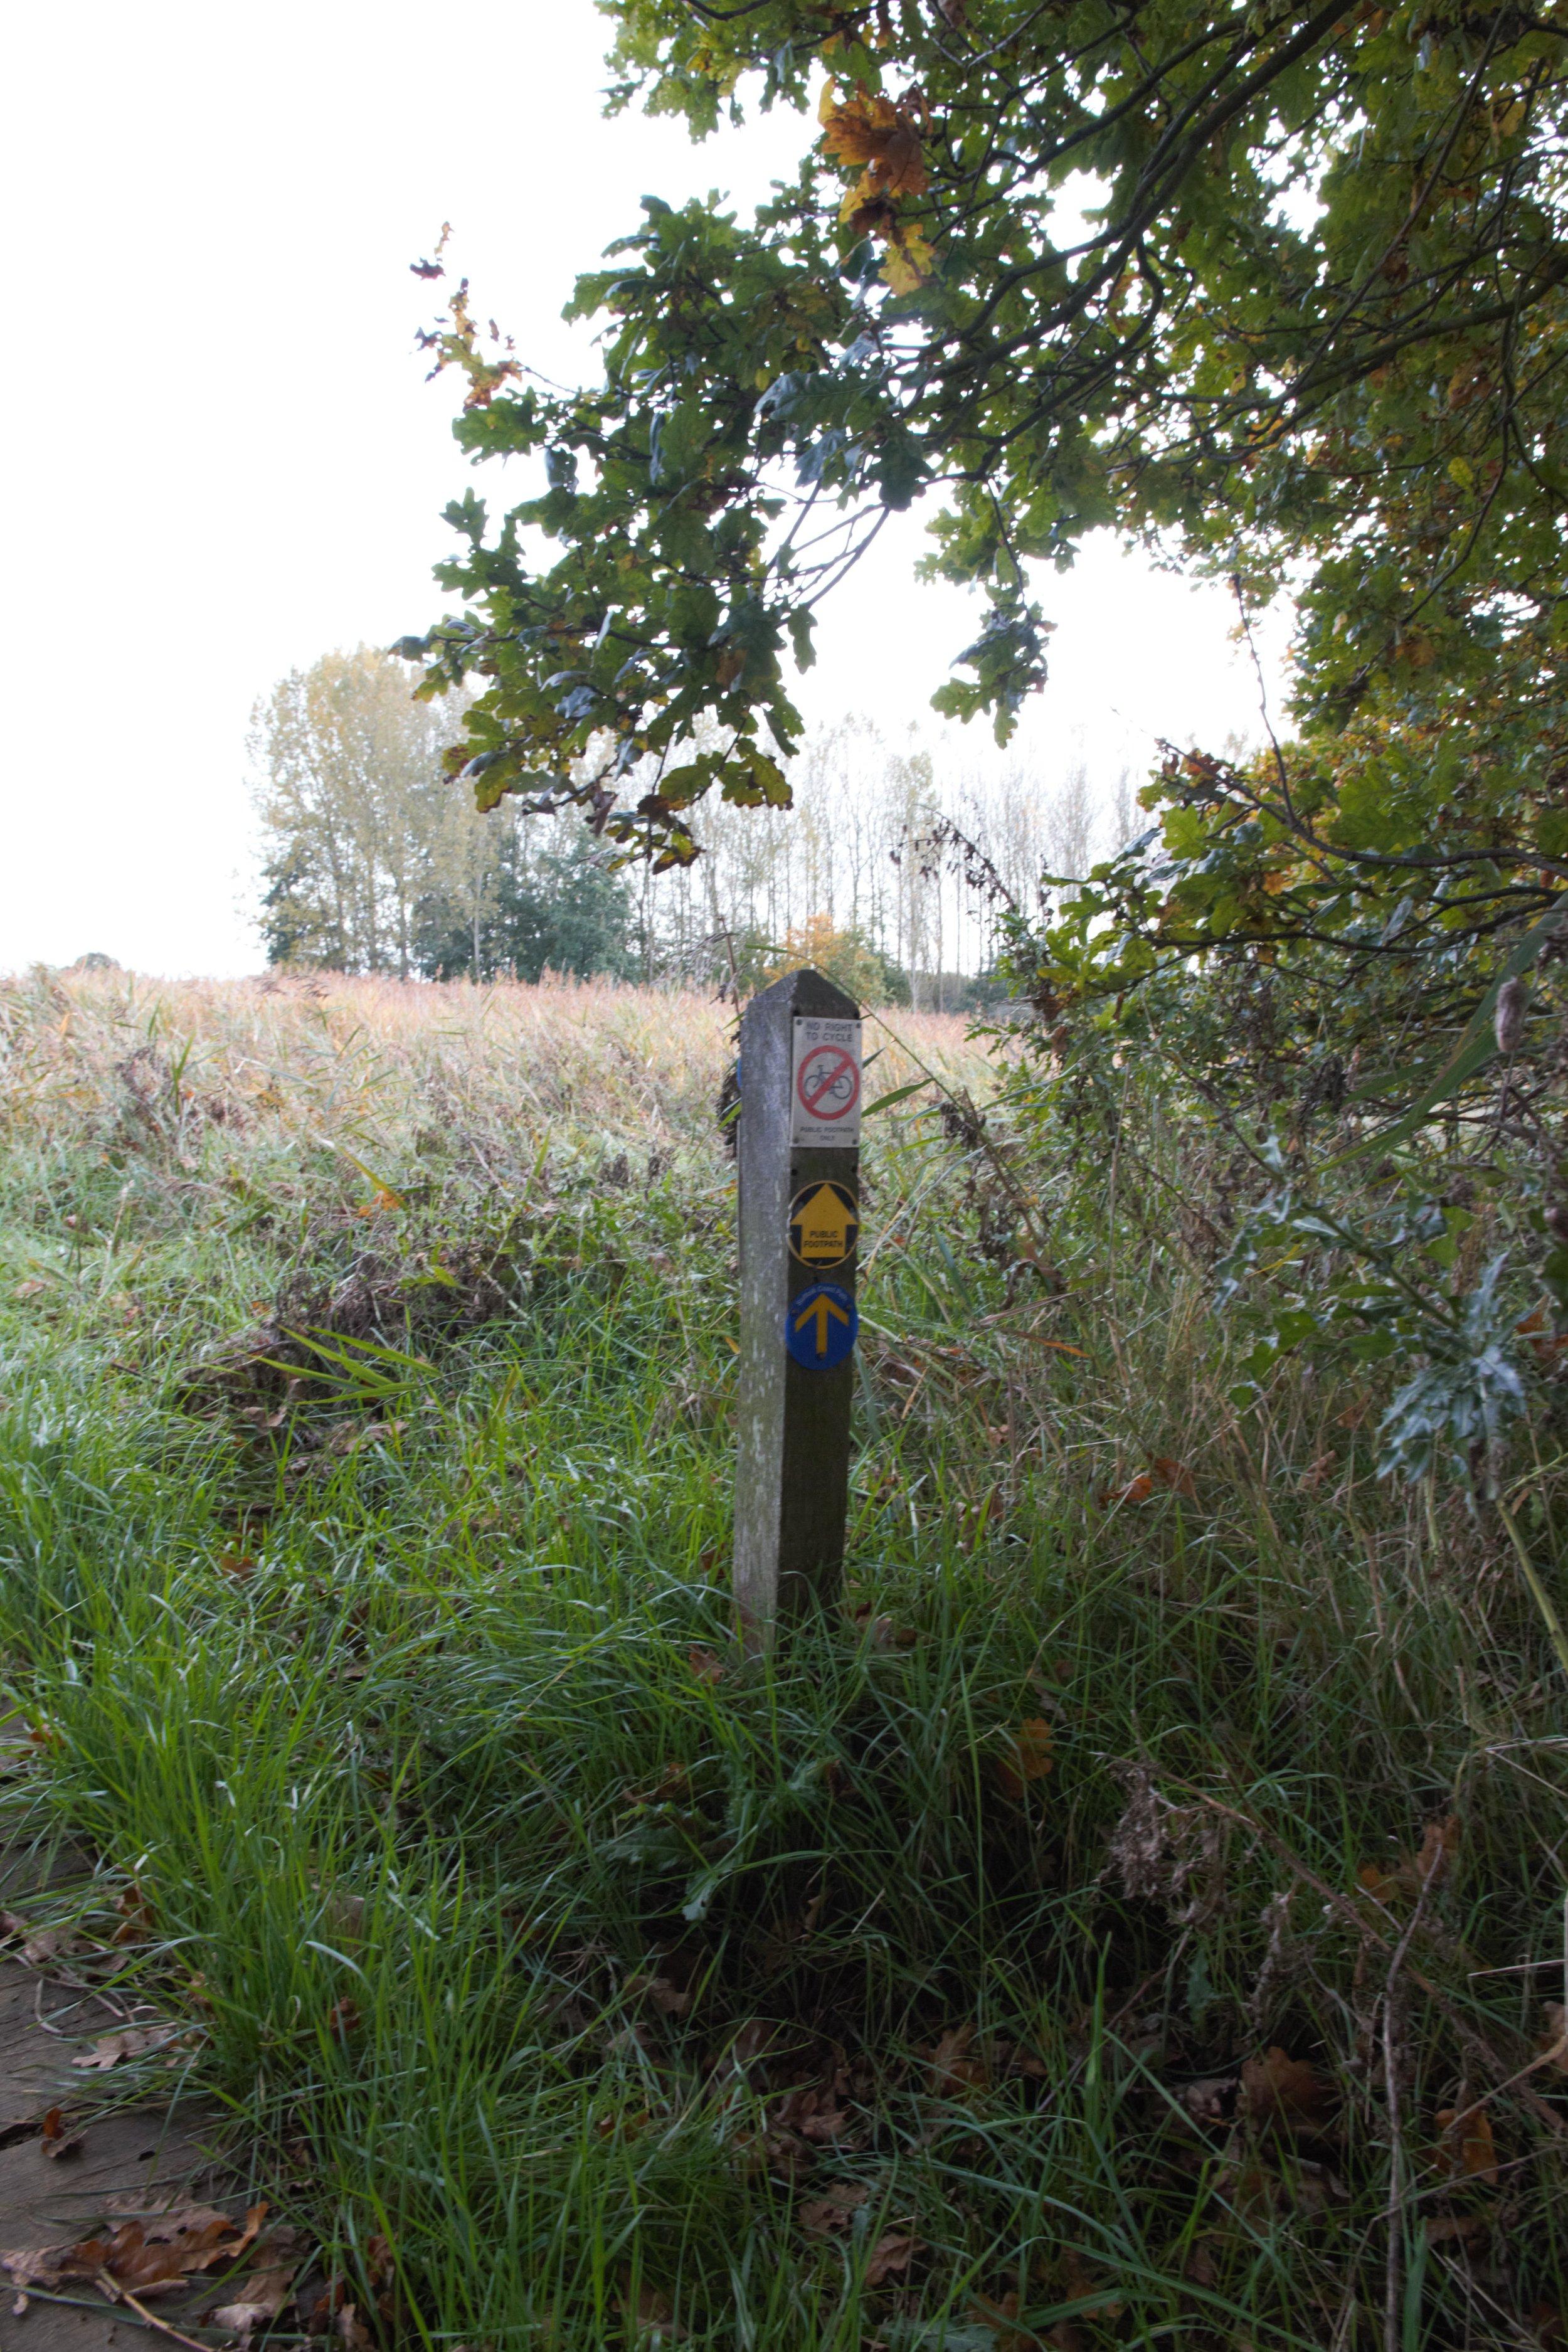 Snape, Suffolk I (2).jpg